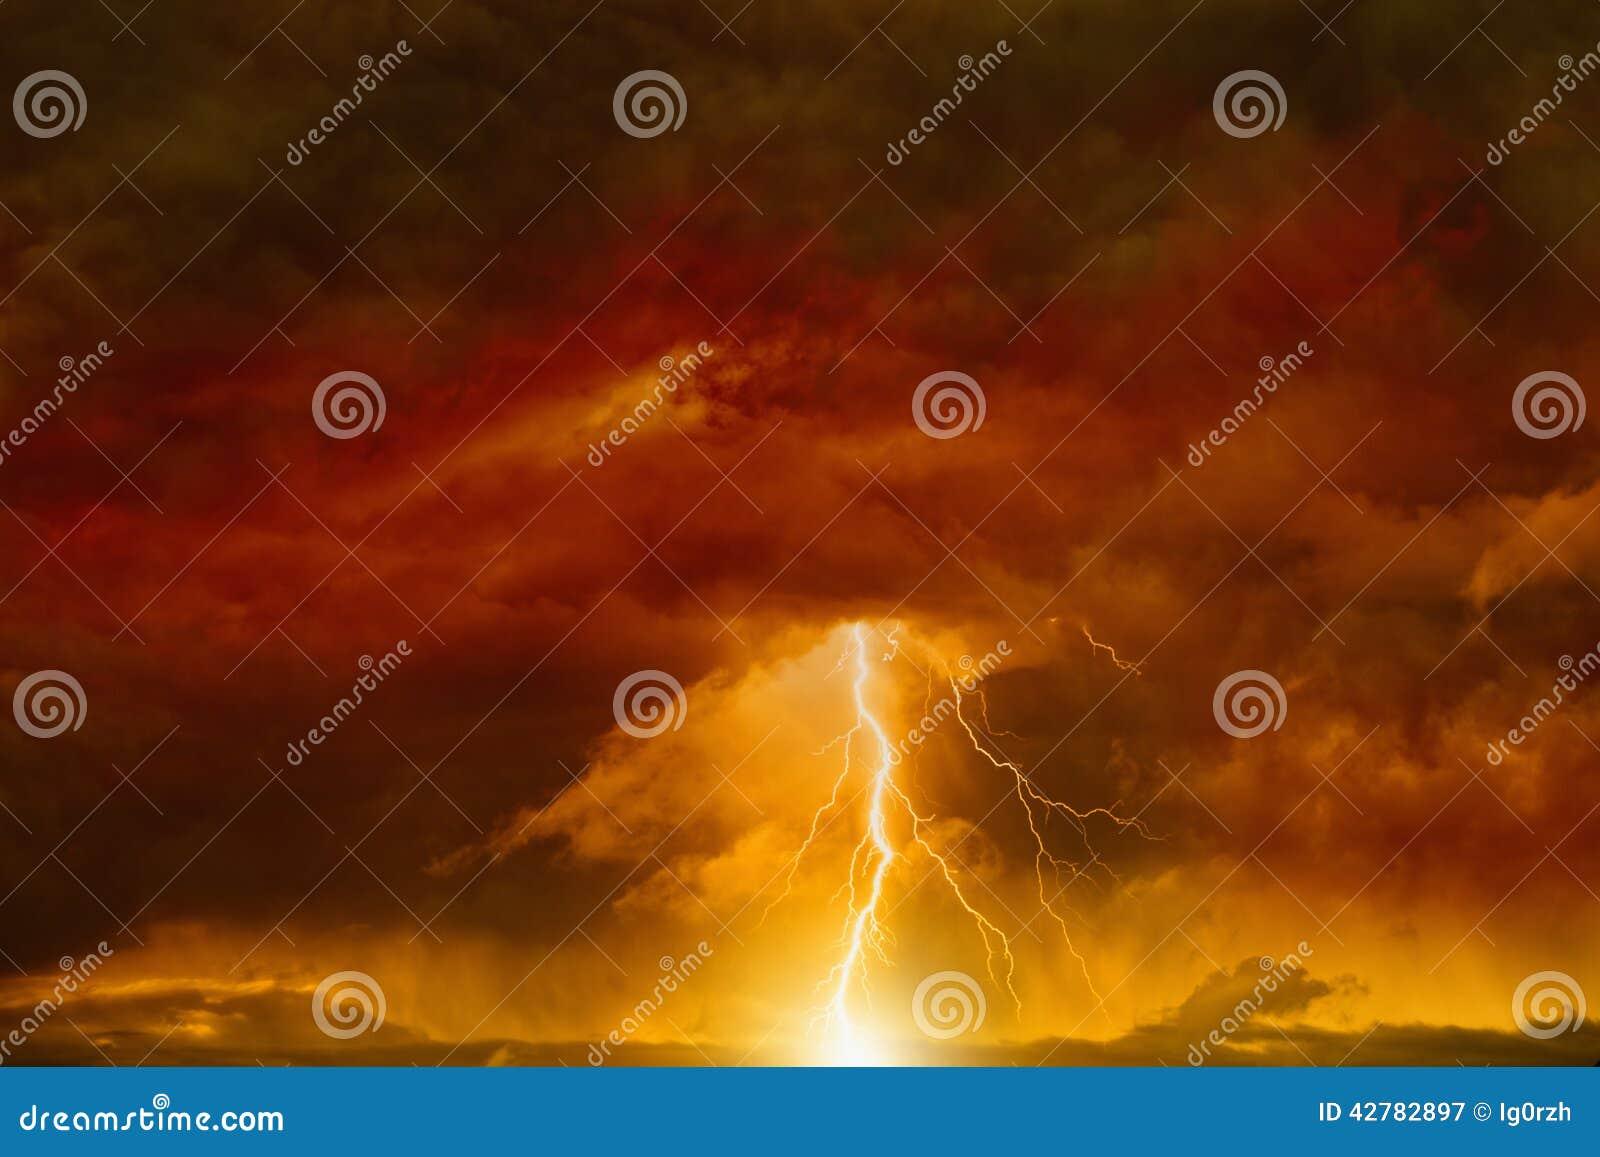 Dark red sky with lightning